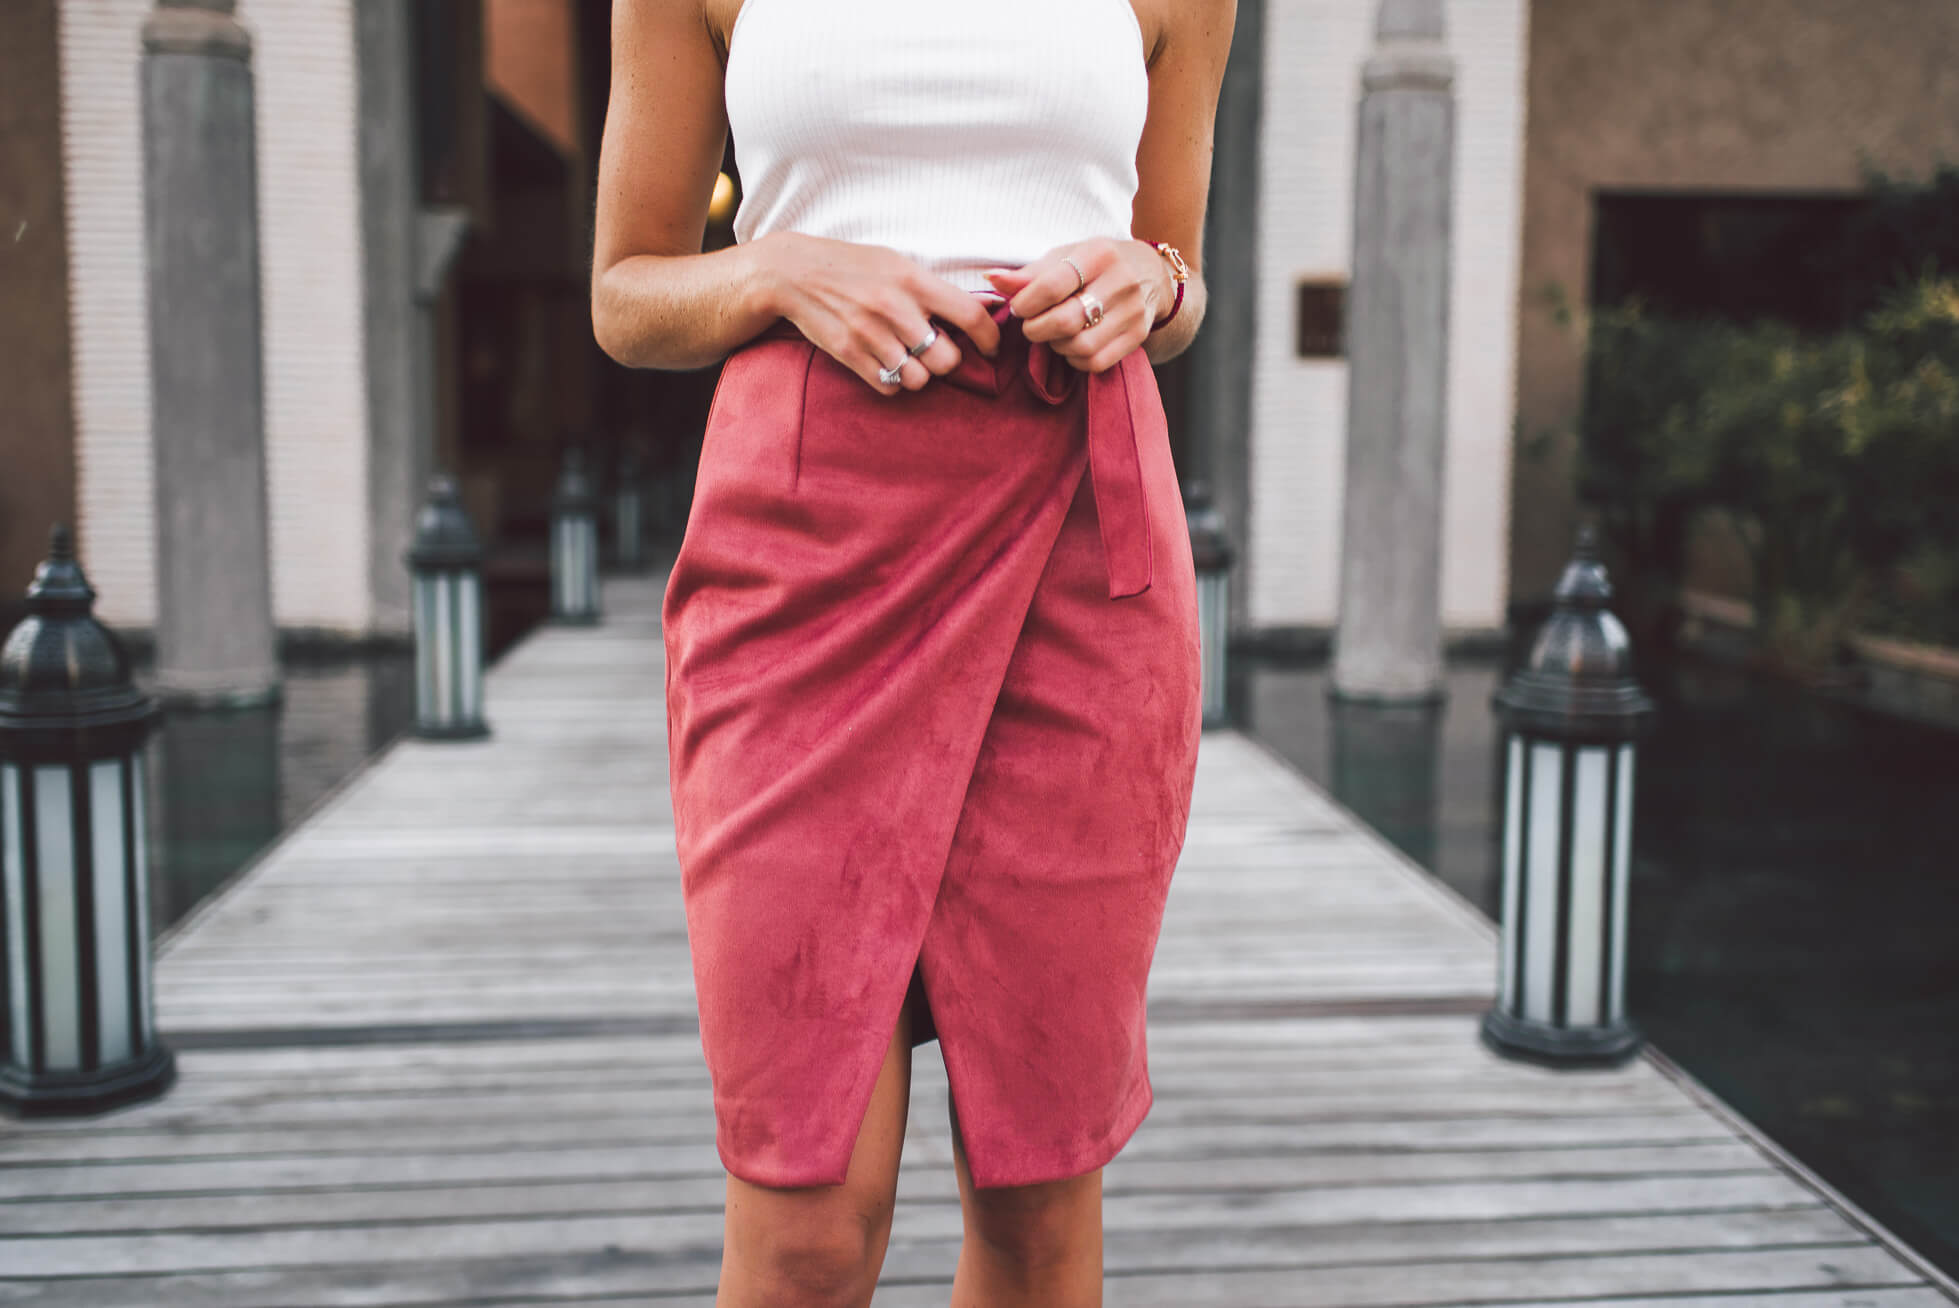 janni-deler-burgundy-skirtDSC_0011